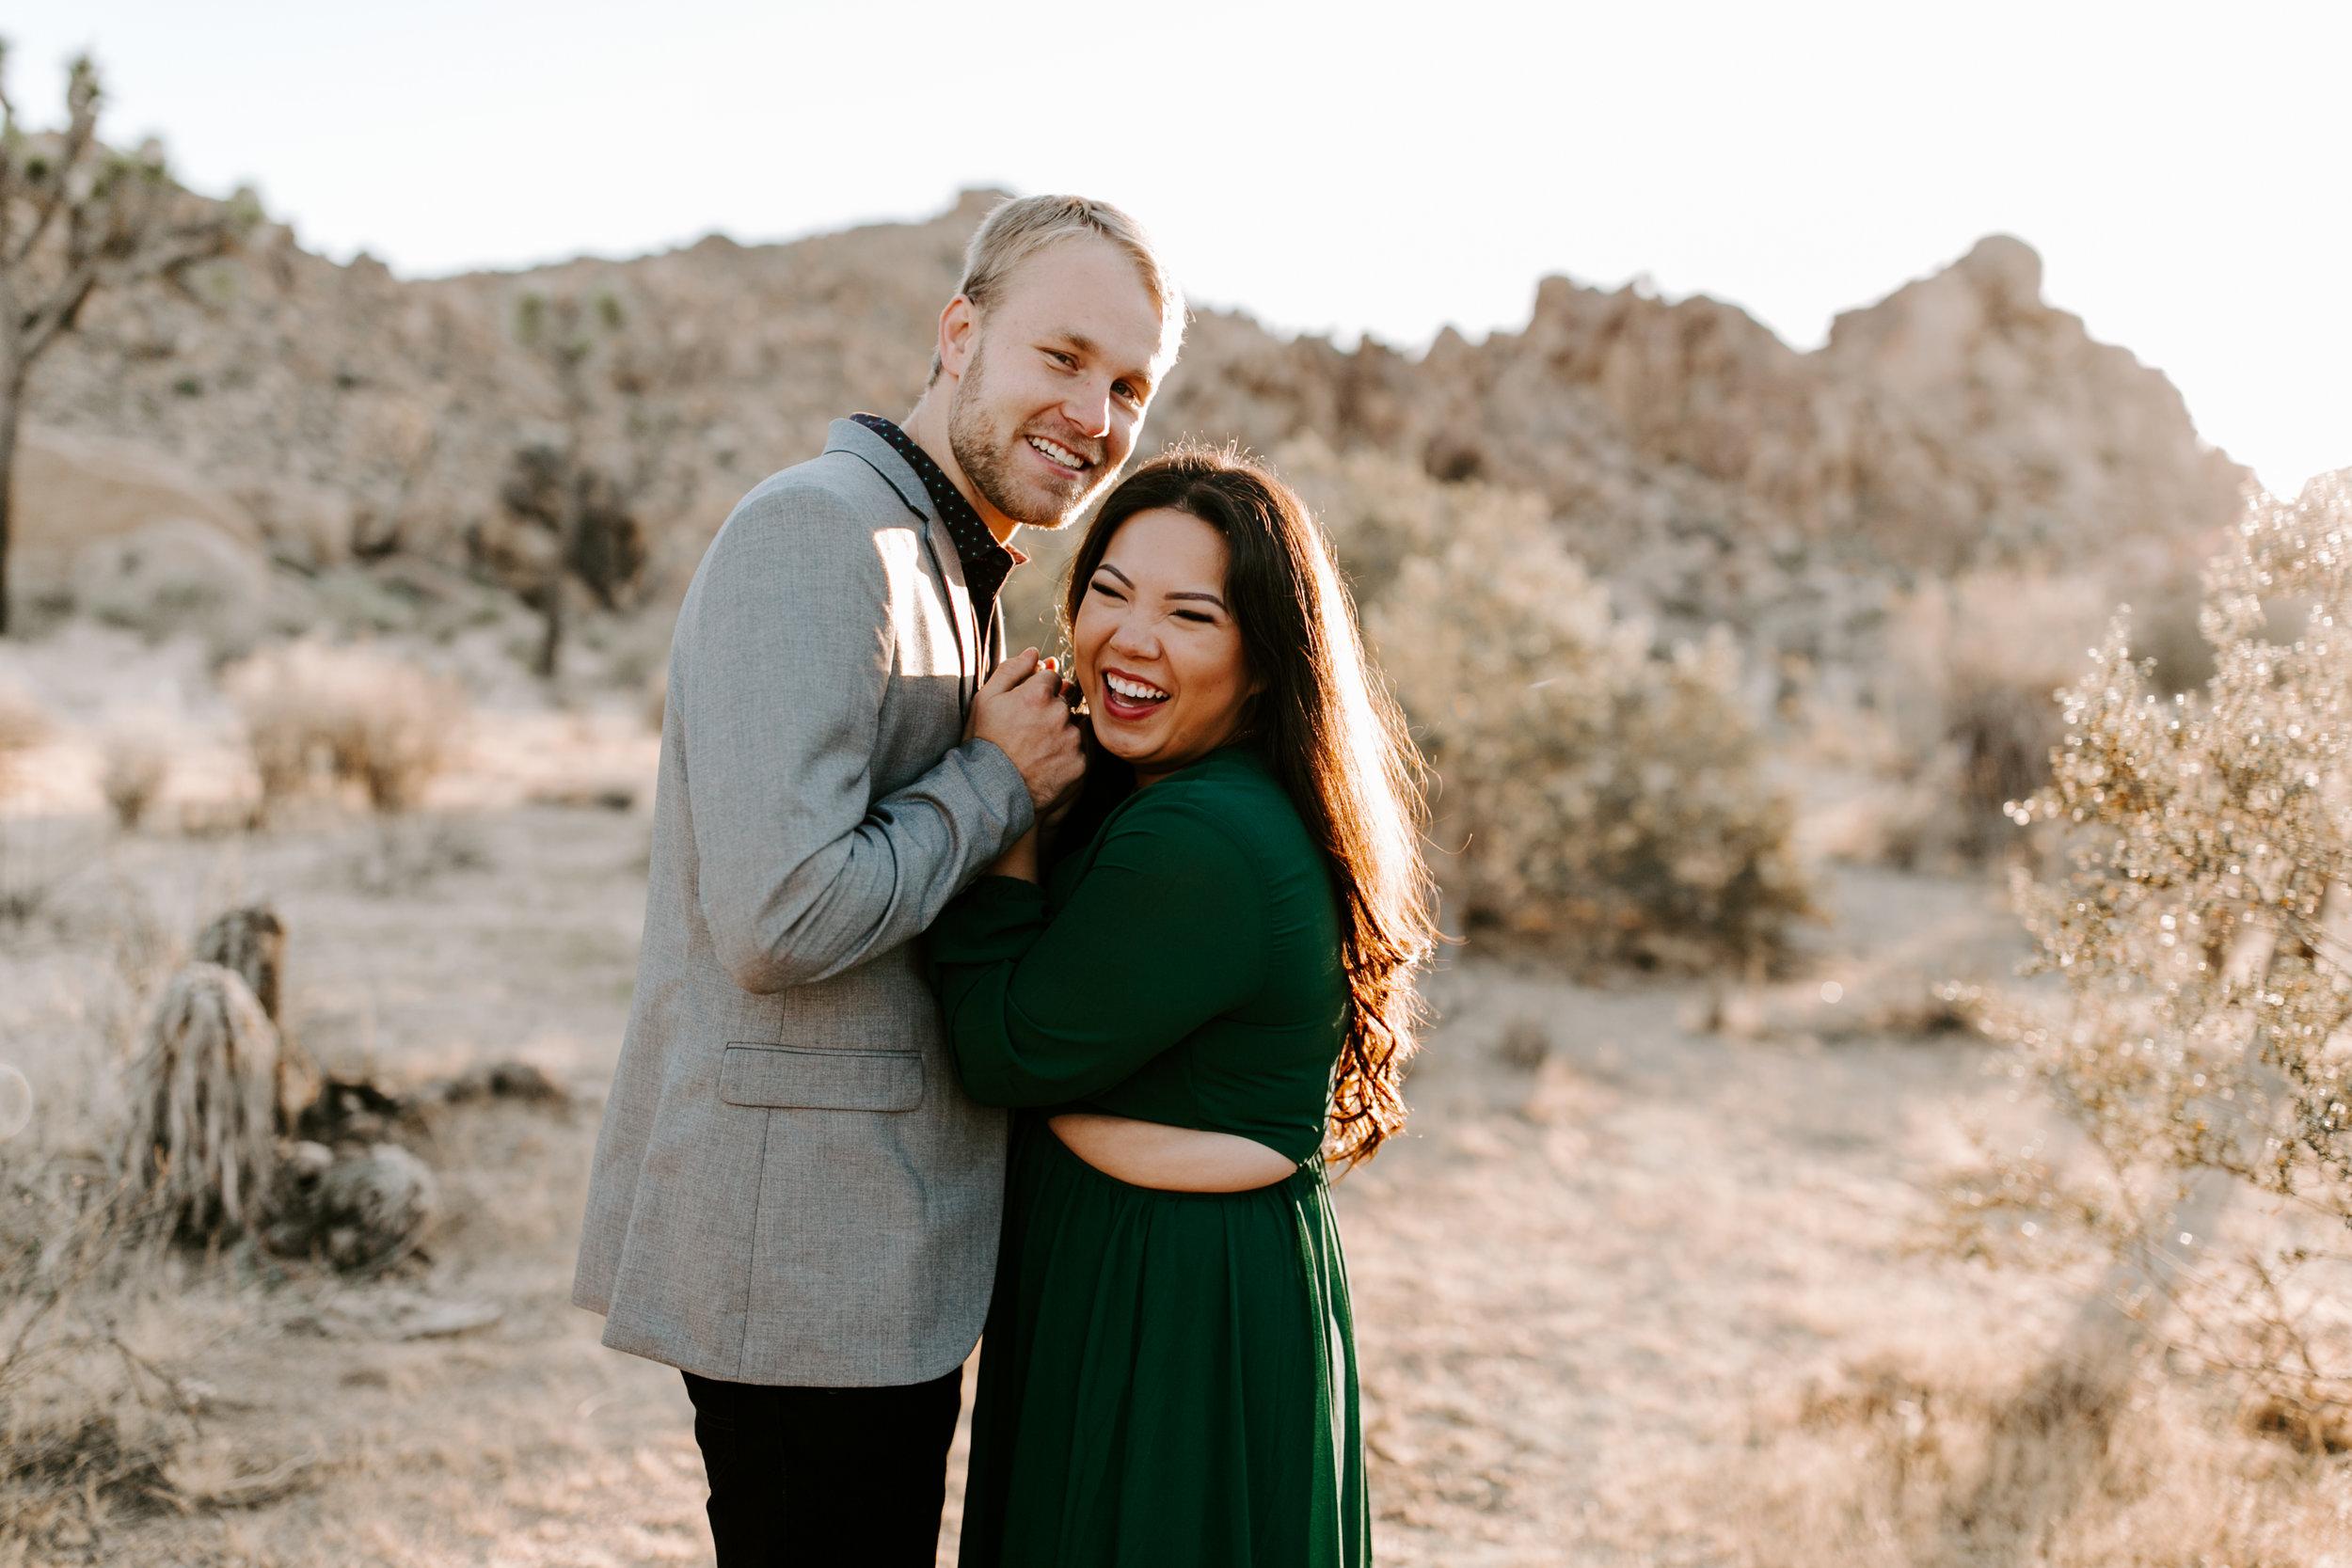 joshua-tree-elopement-photographer-california-wedding-photographer-48.jpg